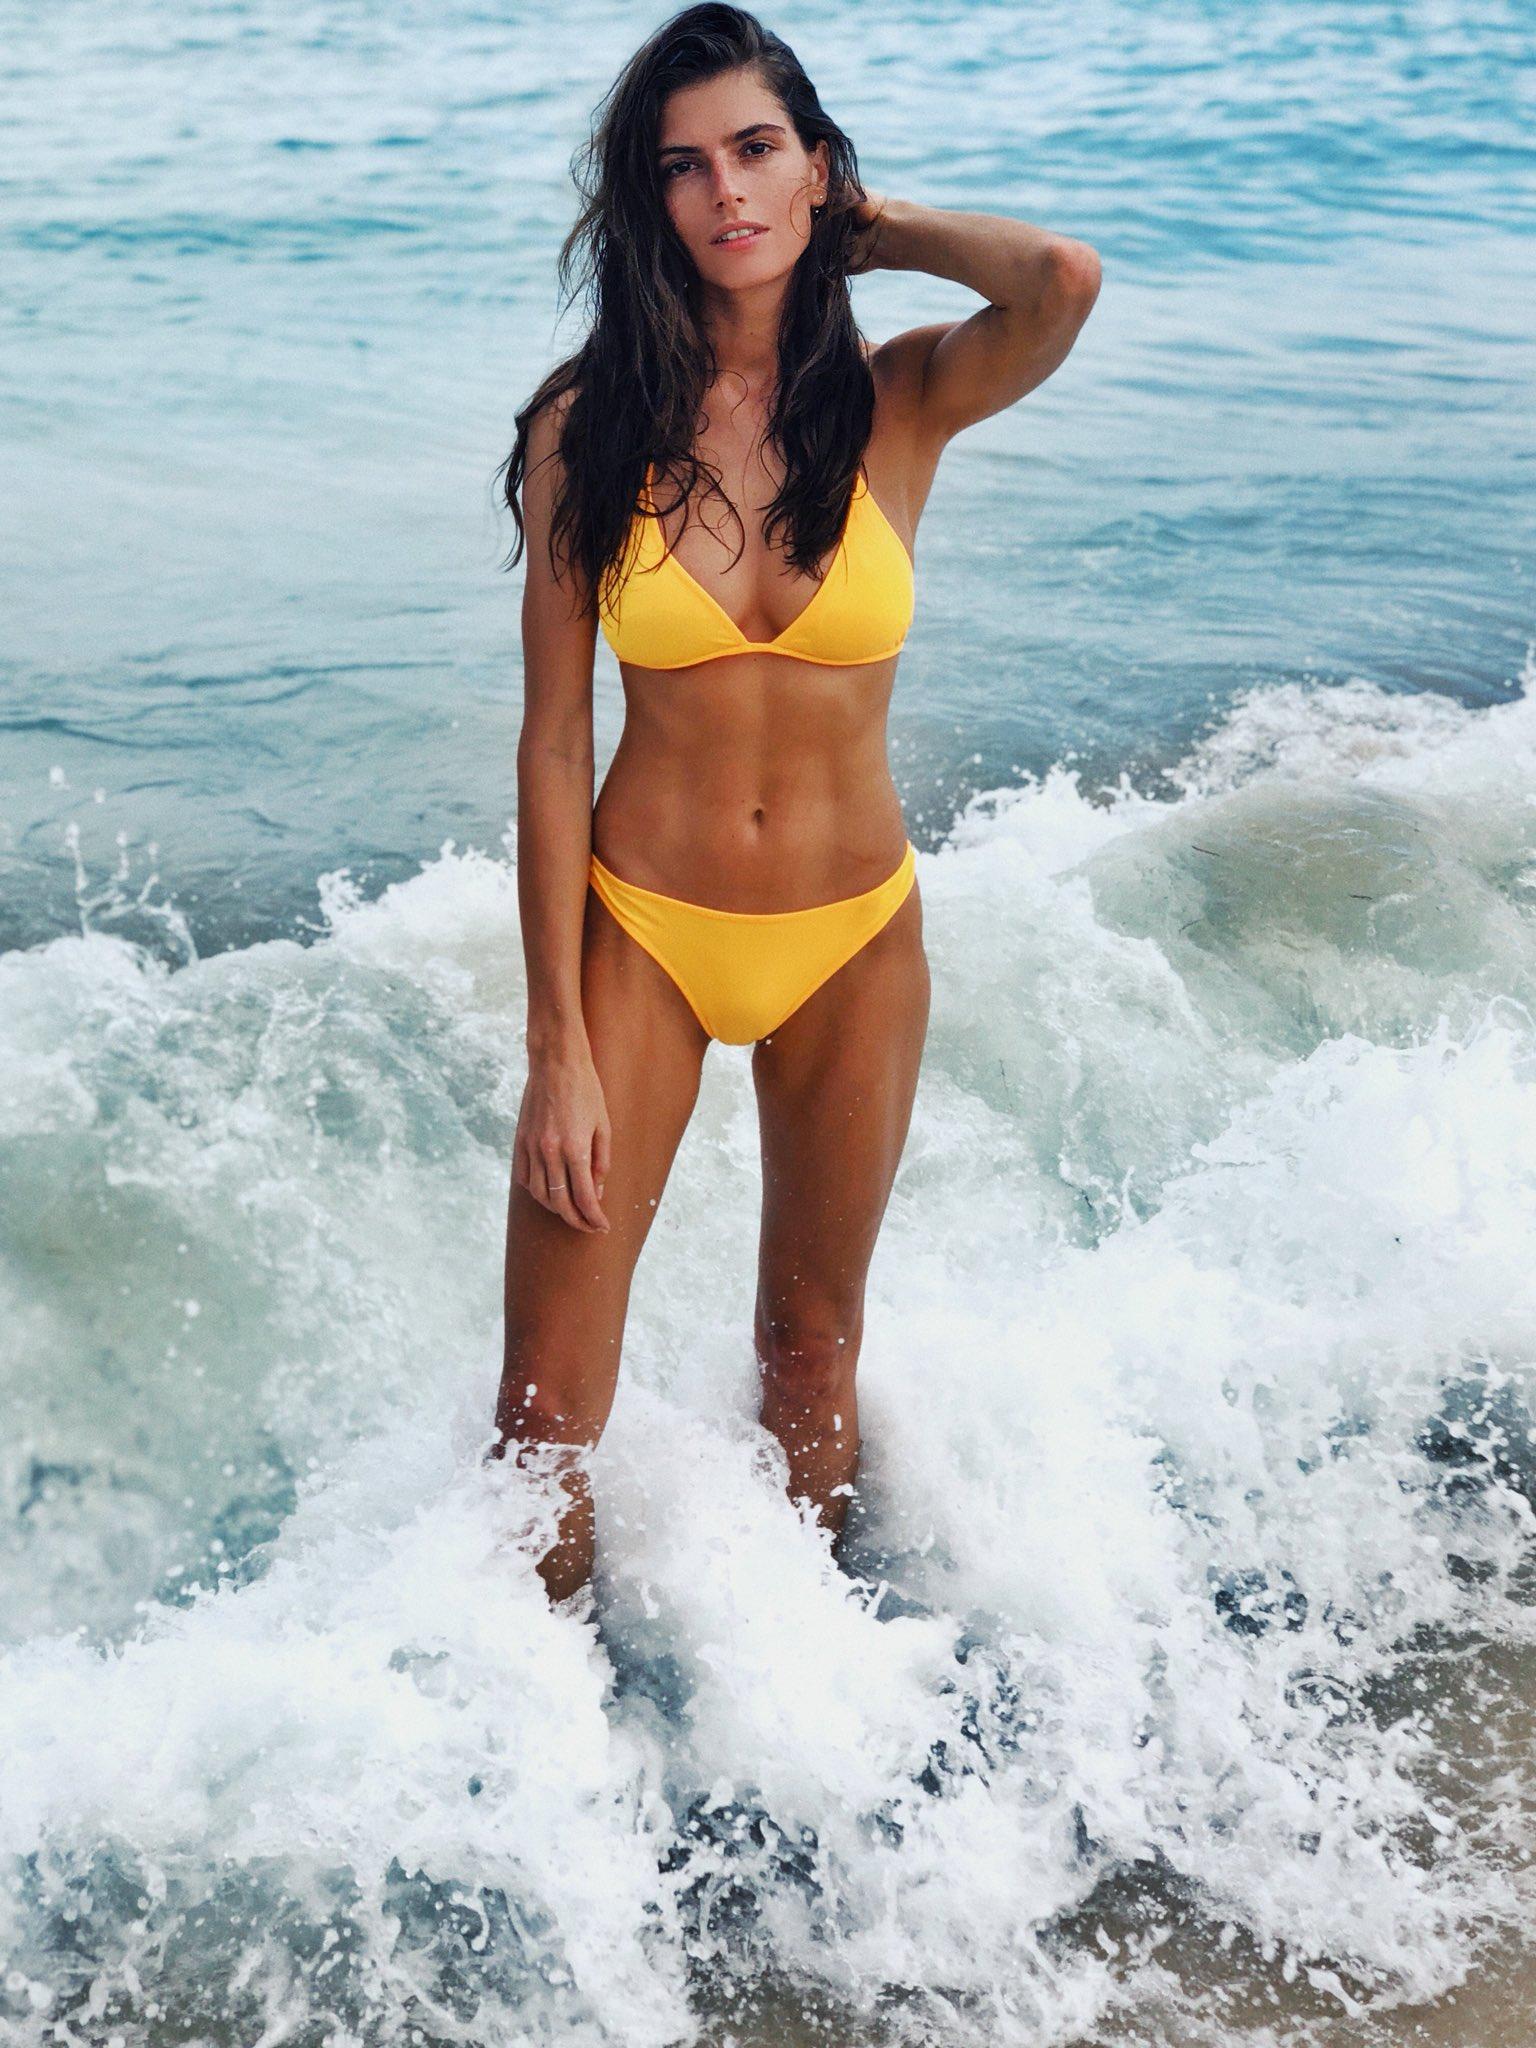 Bikini Dasha Malygina naked (41 foto and video), Topless, Paparazzi, Instagram, in bikini 2020